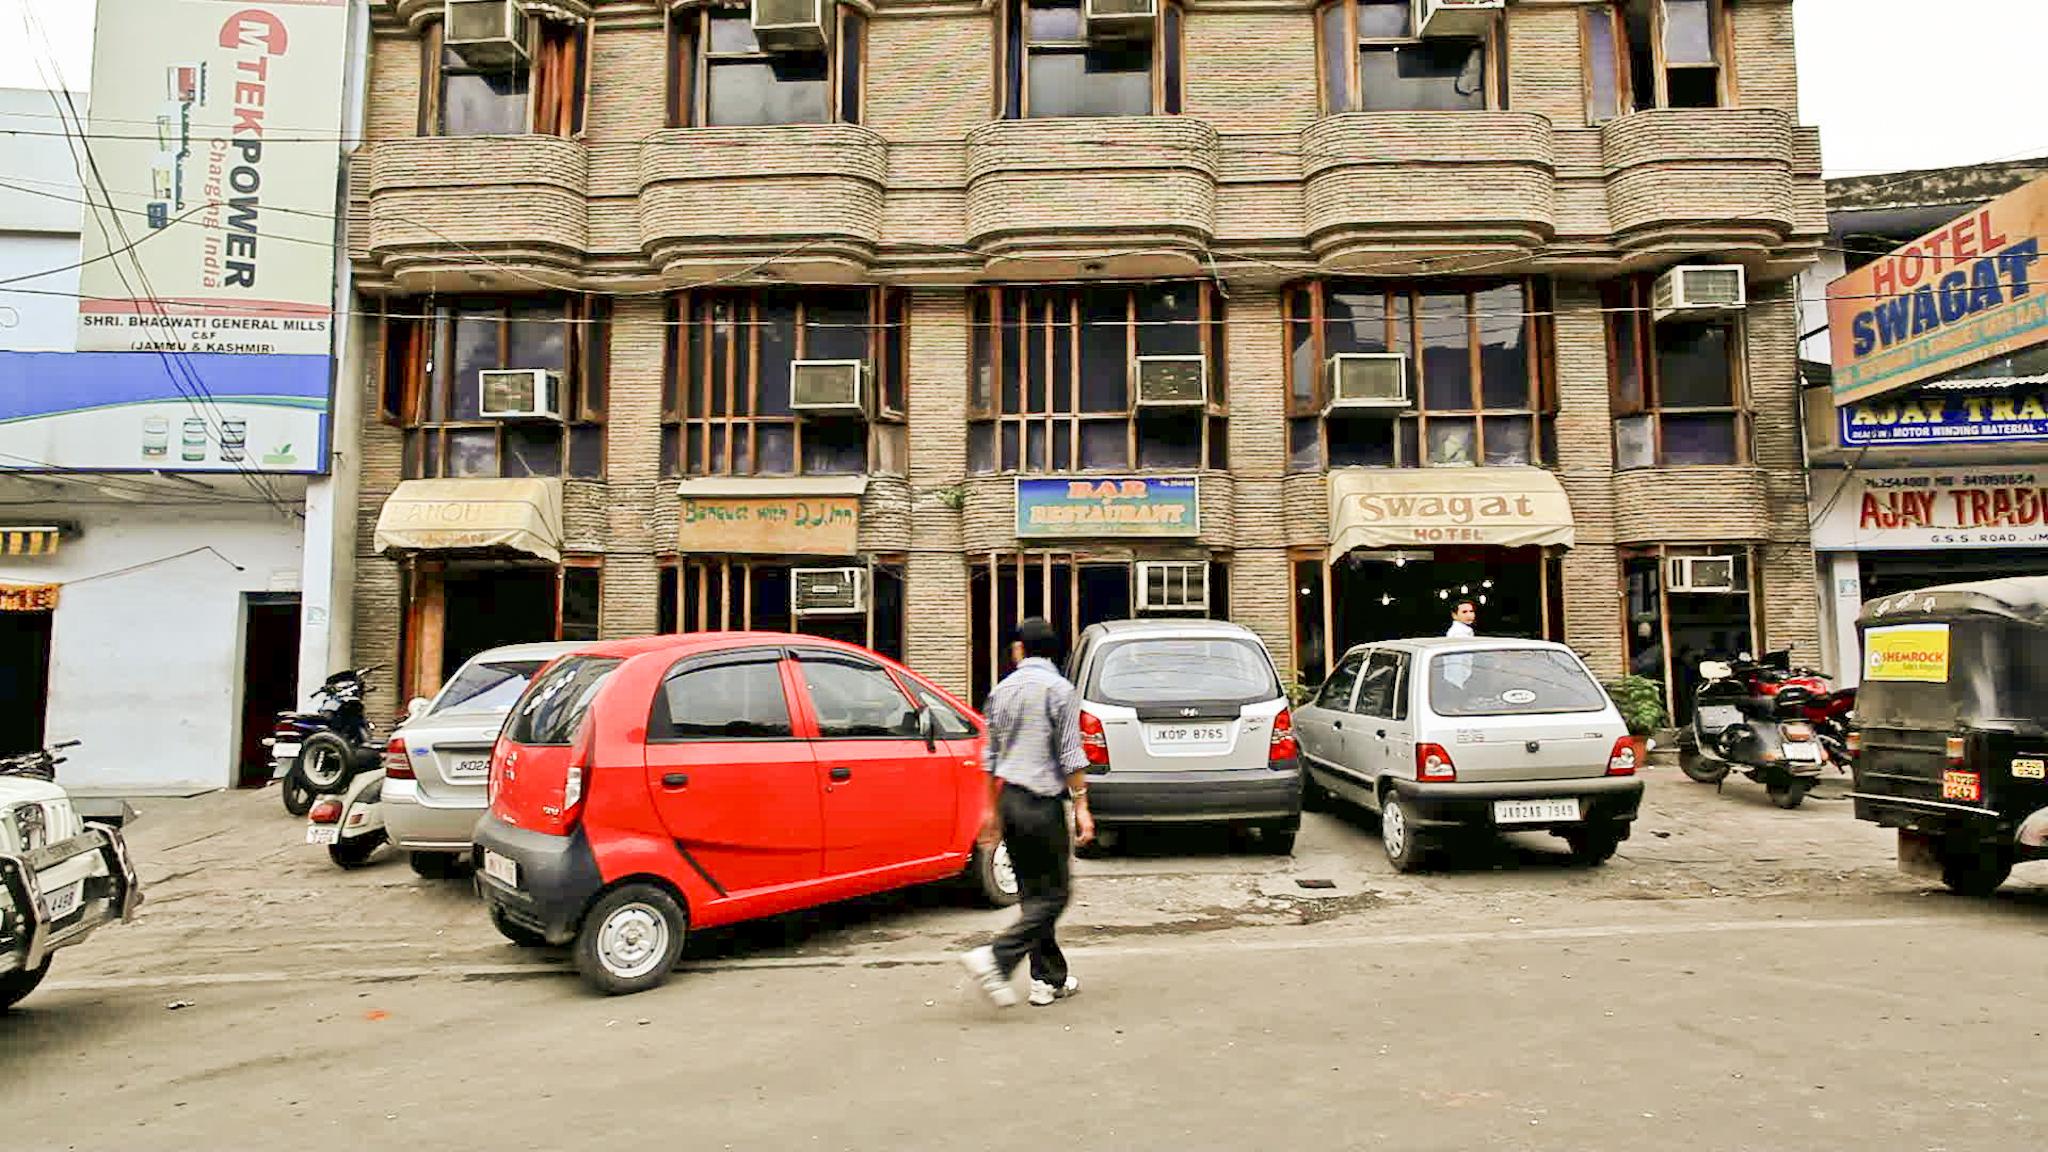 Hotel Swagat in Jammu